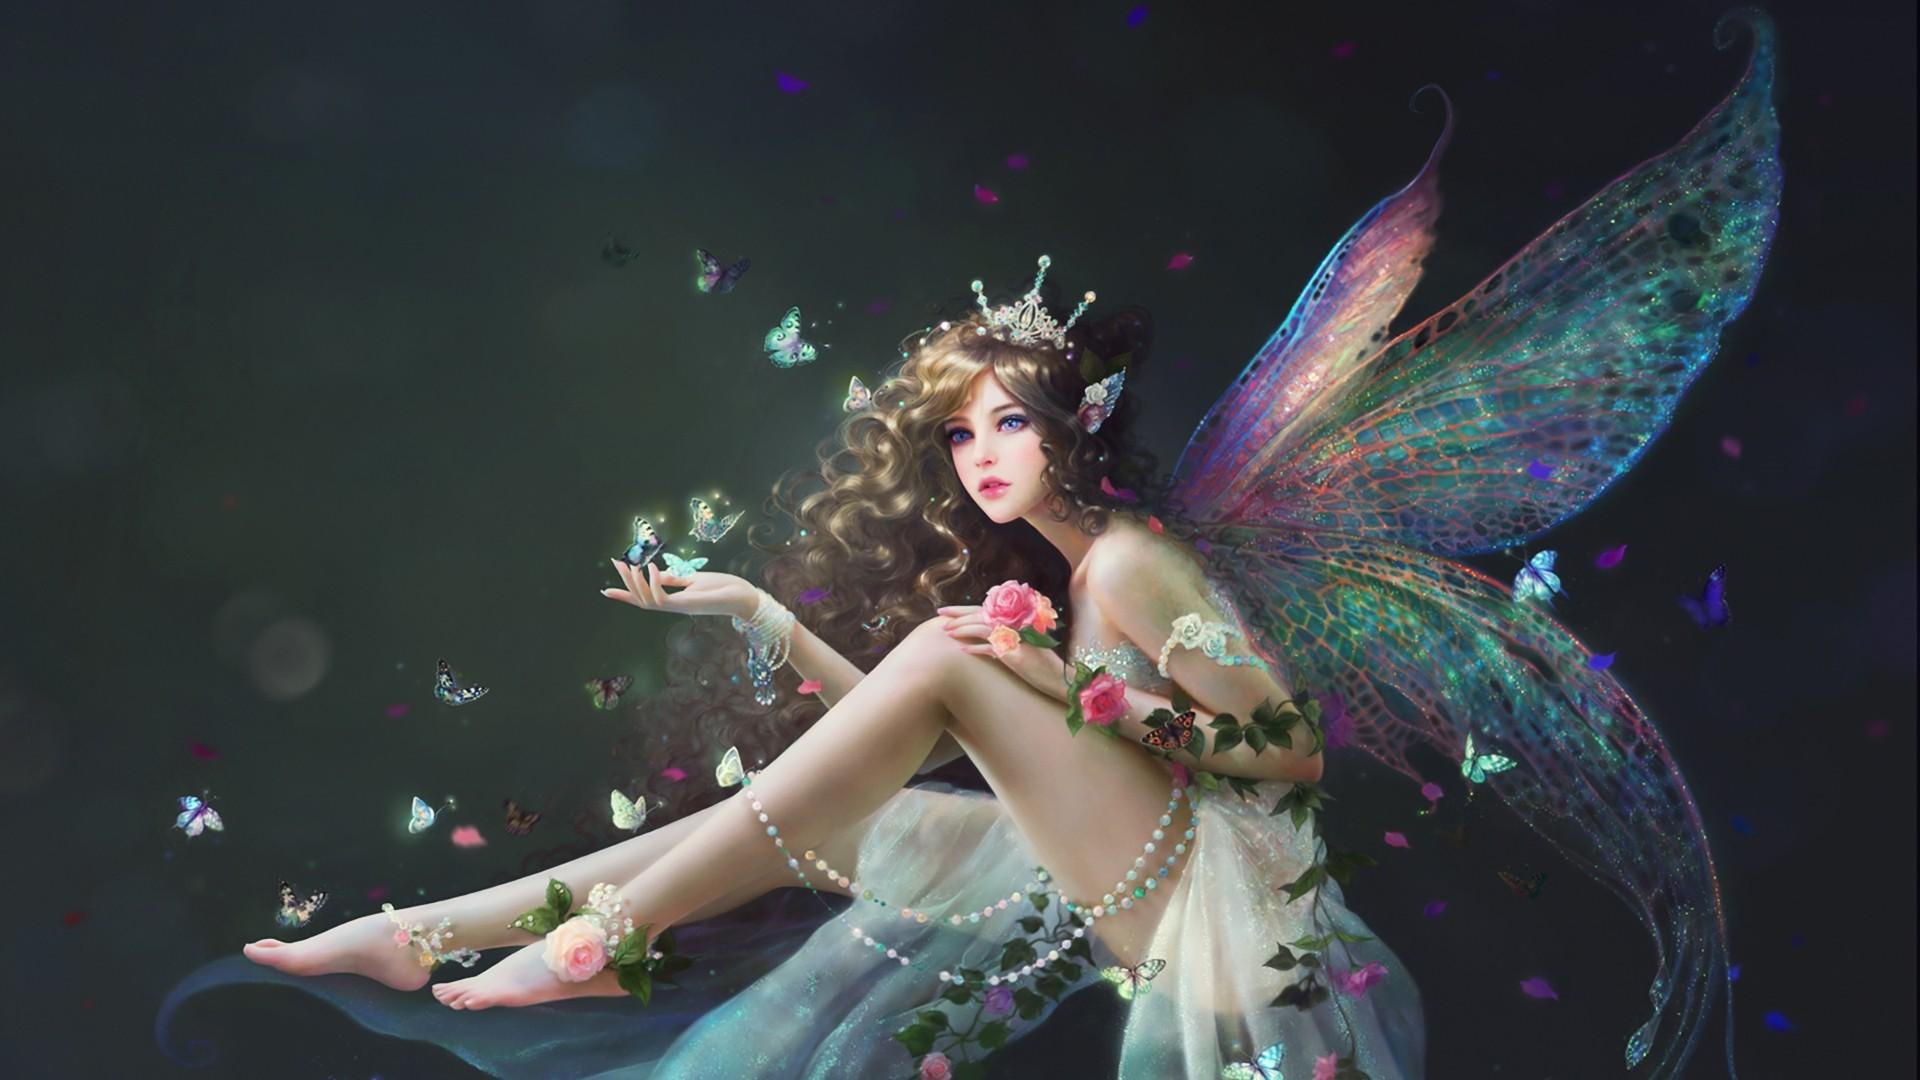 Fairy computer wallpaper